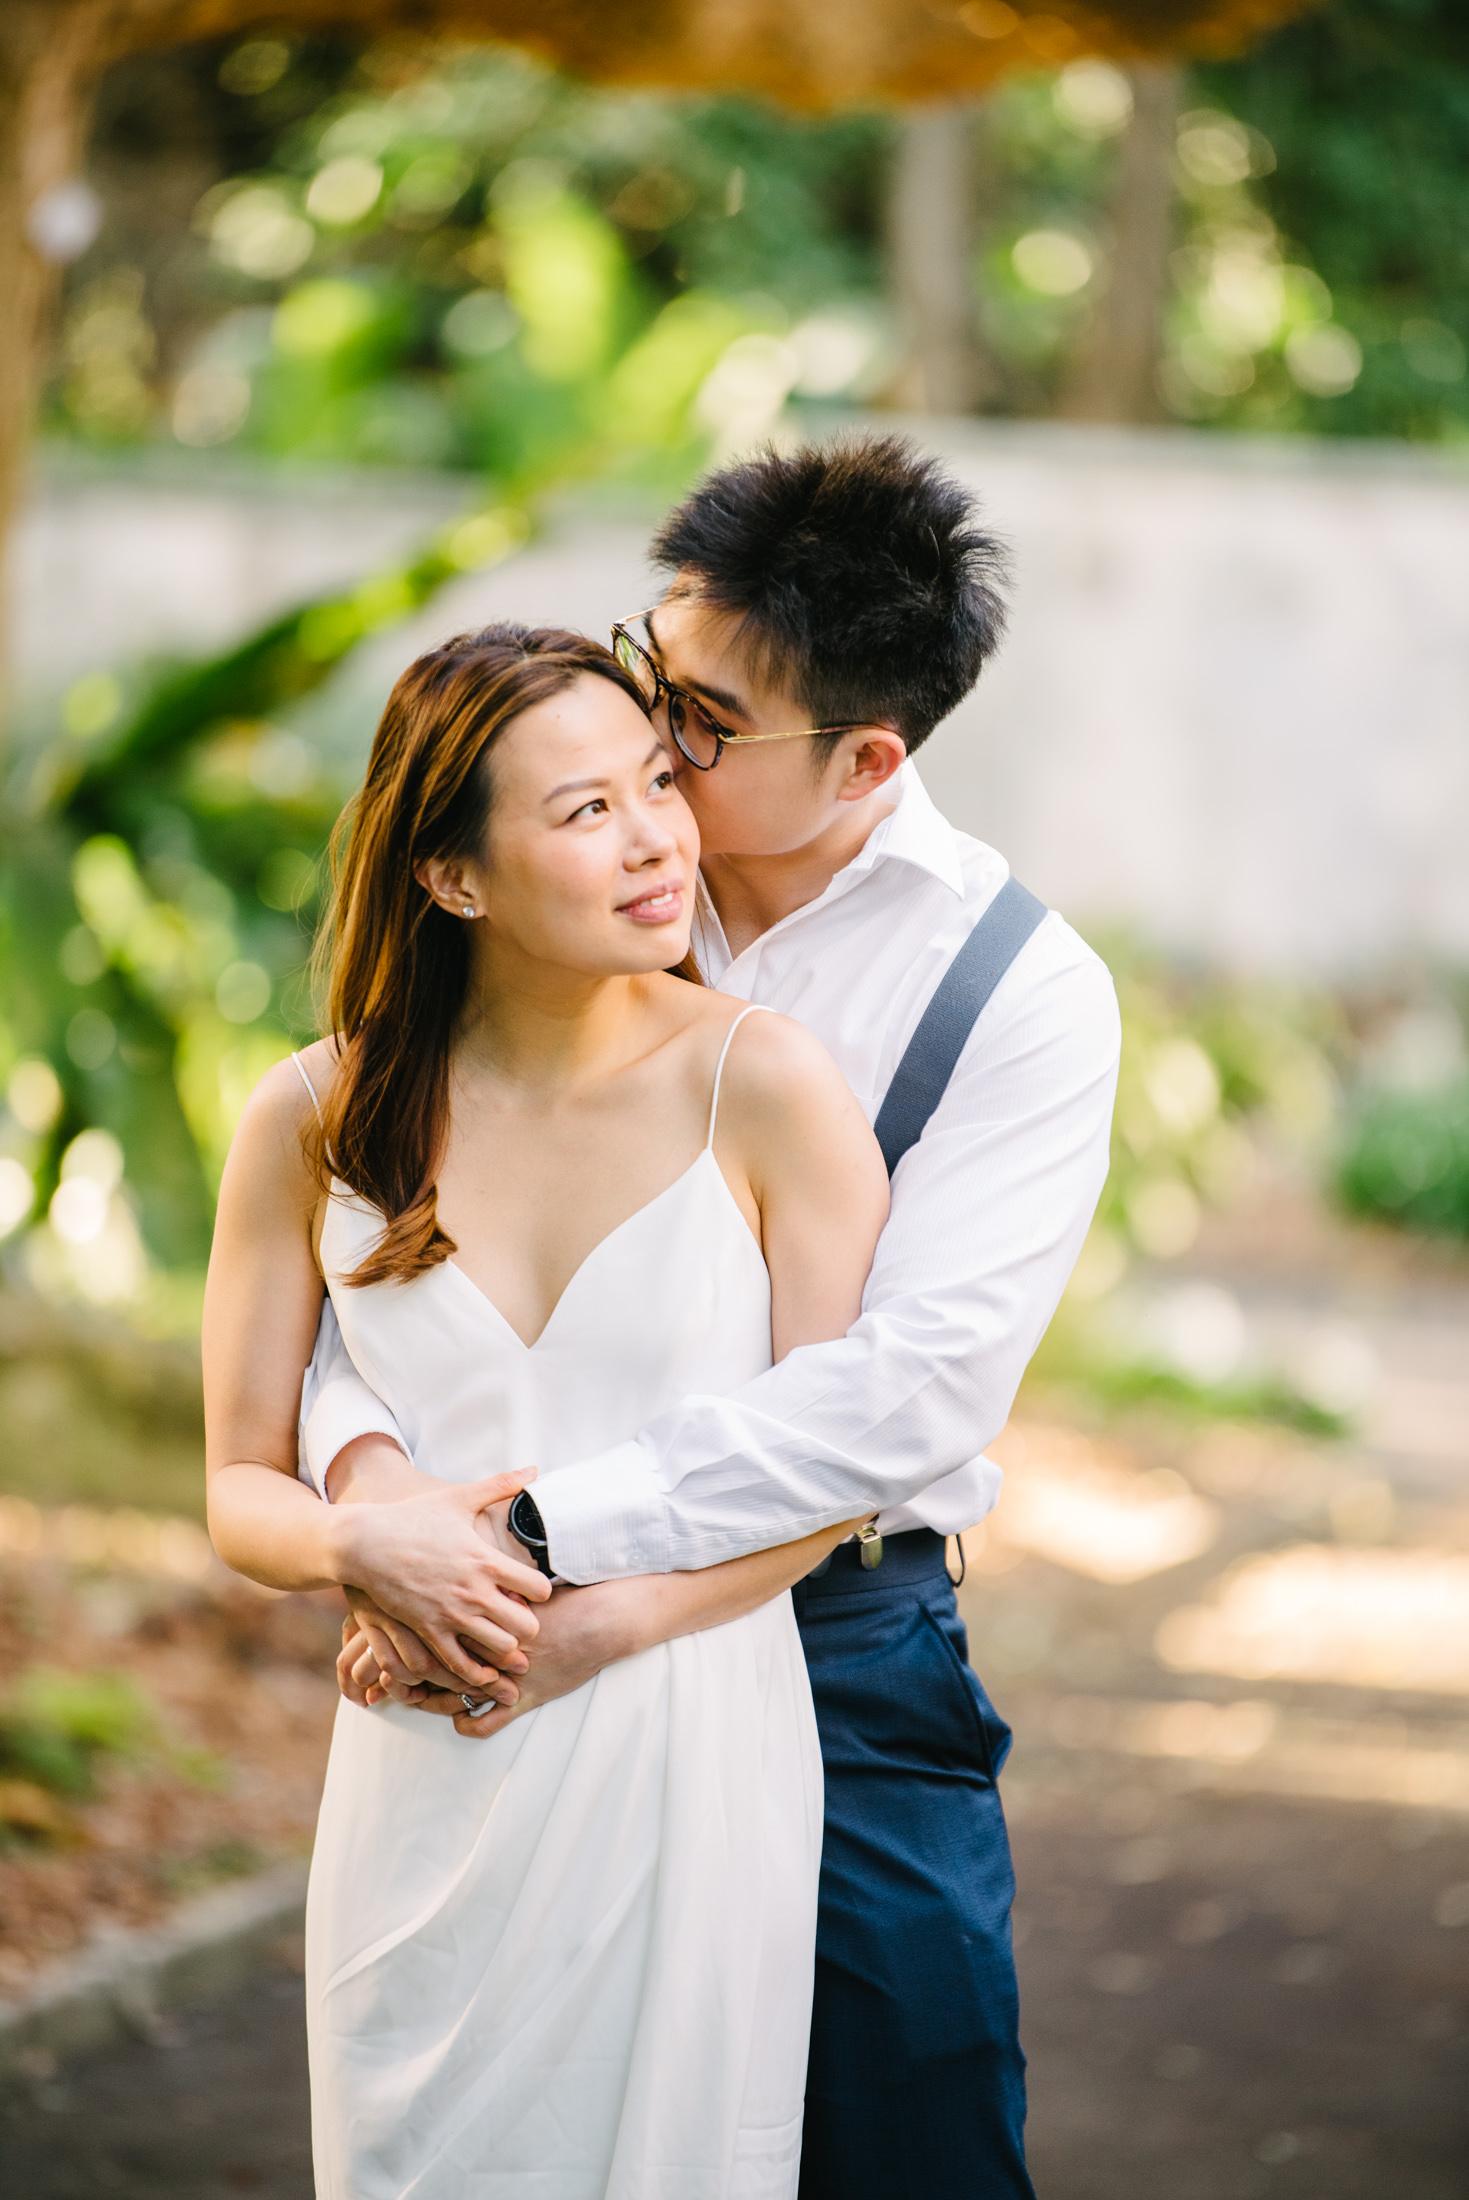 Linda Zhen